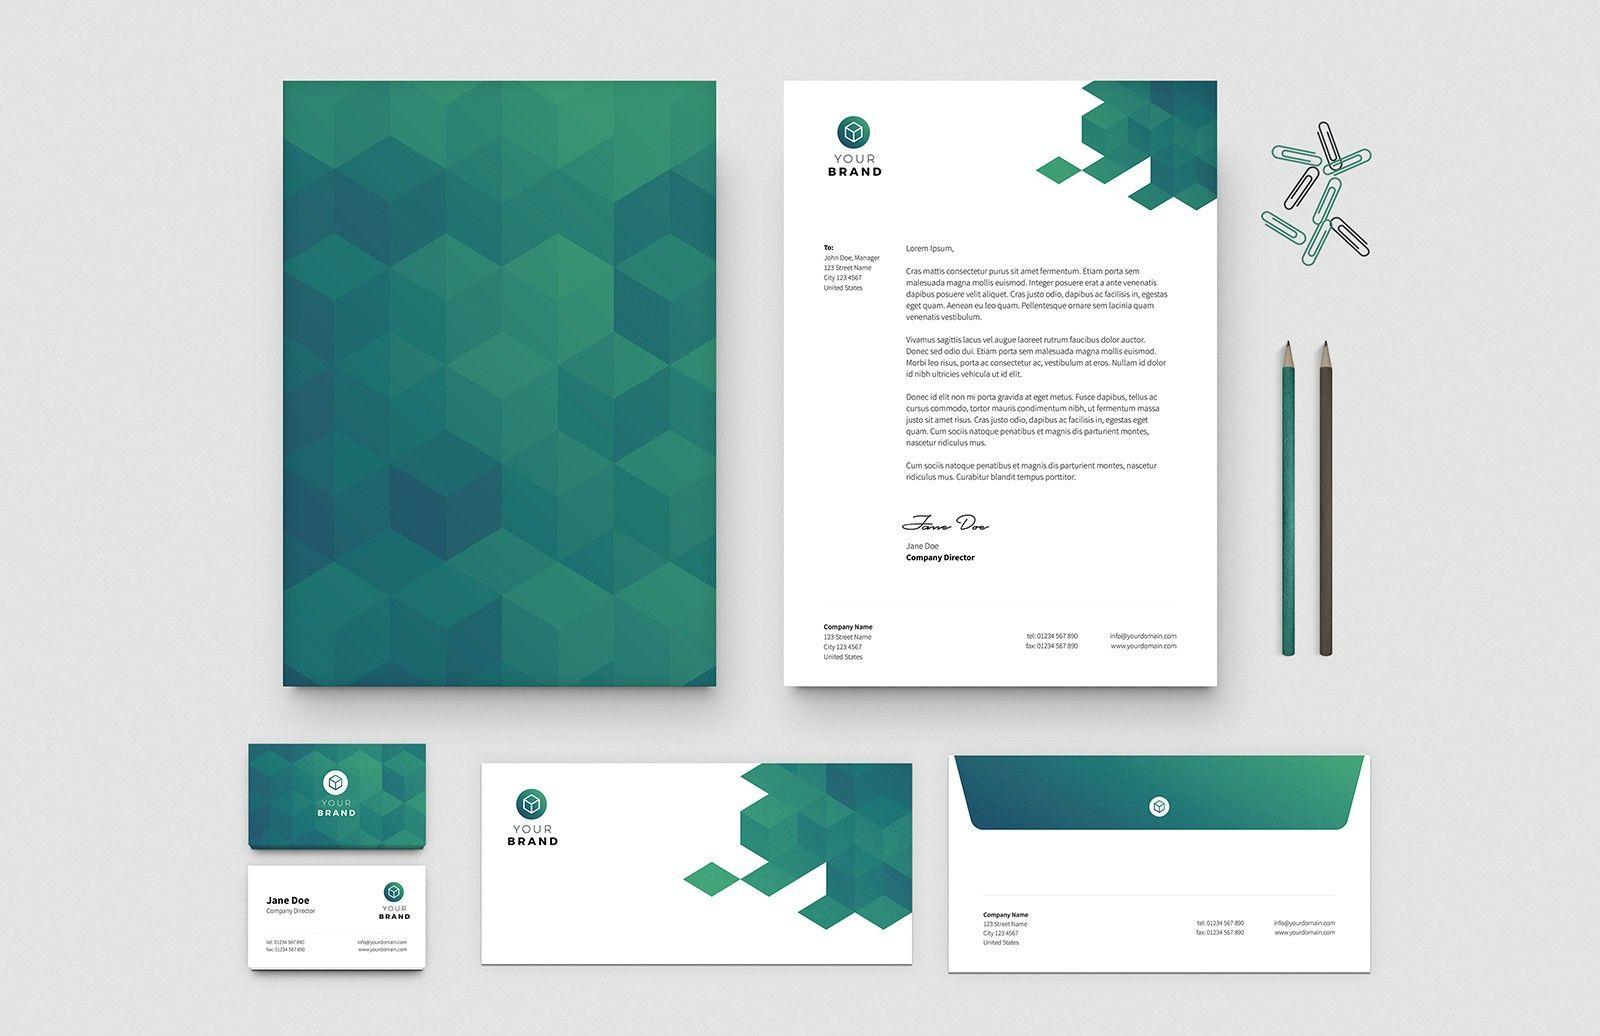 Free Business Card Letterhead Templates Letterhead Design Letterhead Design Inspiration Letterhead Business